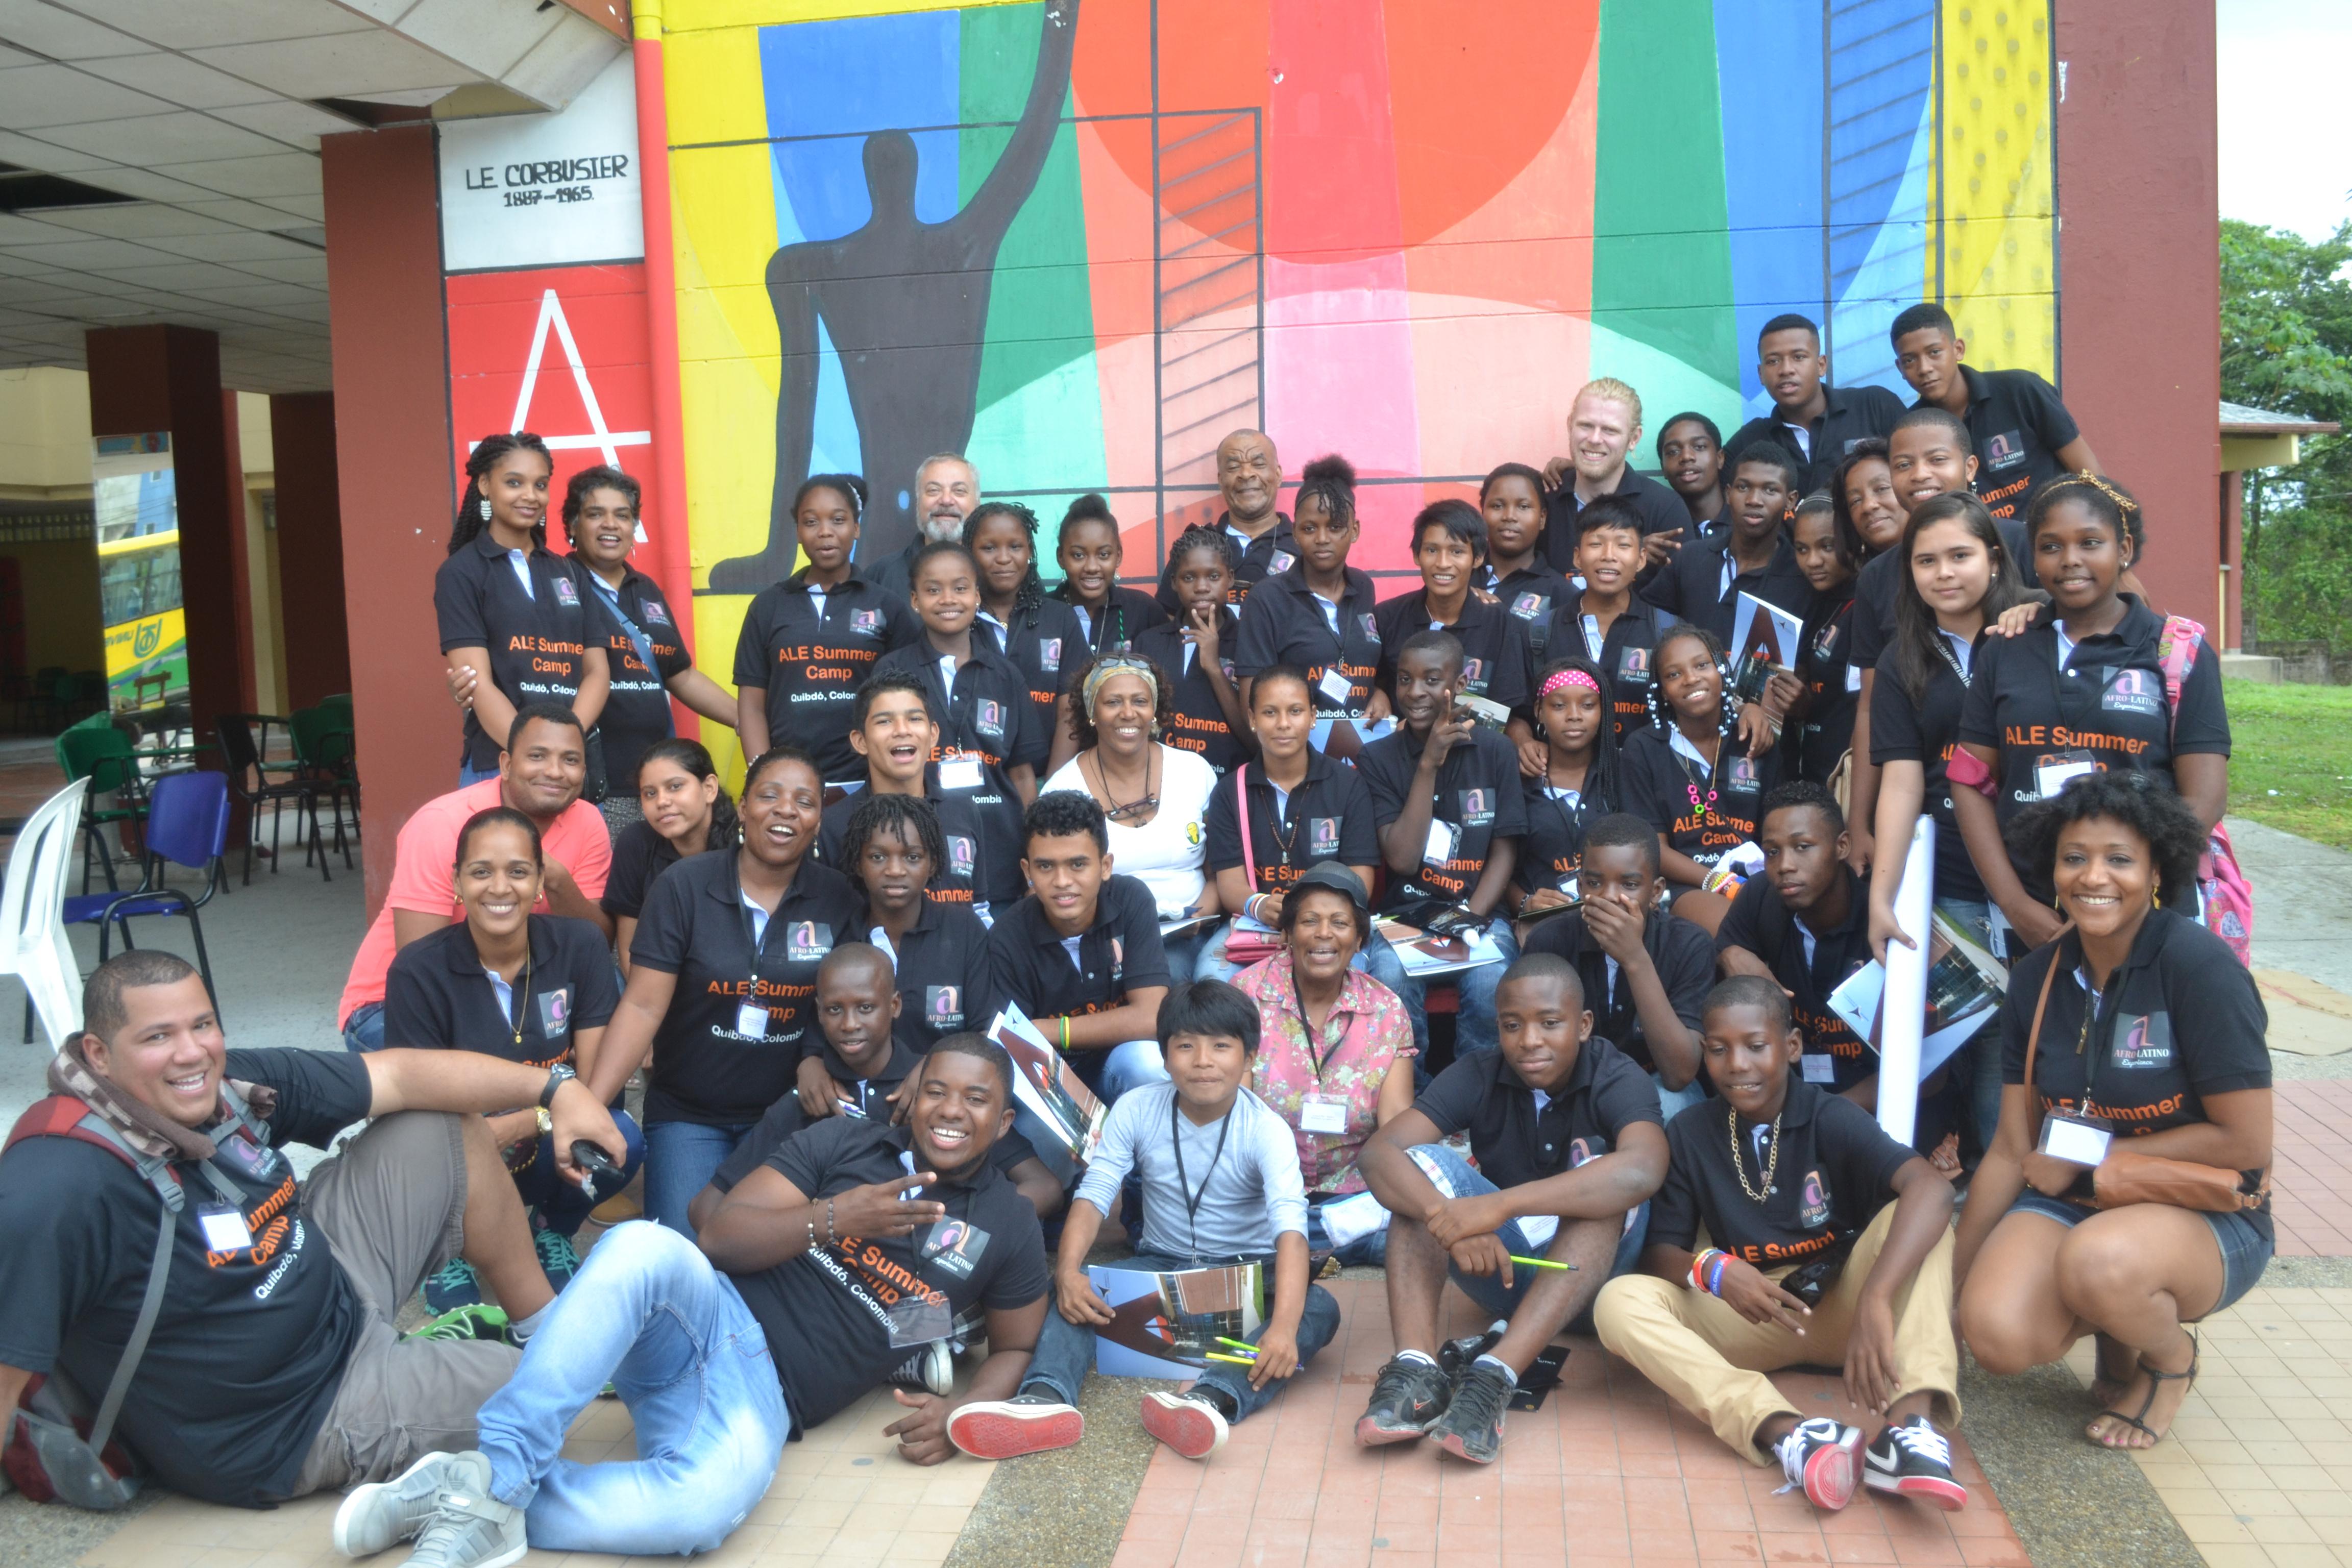 2015 ALE Summer Camp, Quibdó